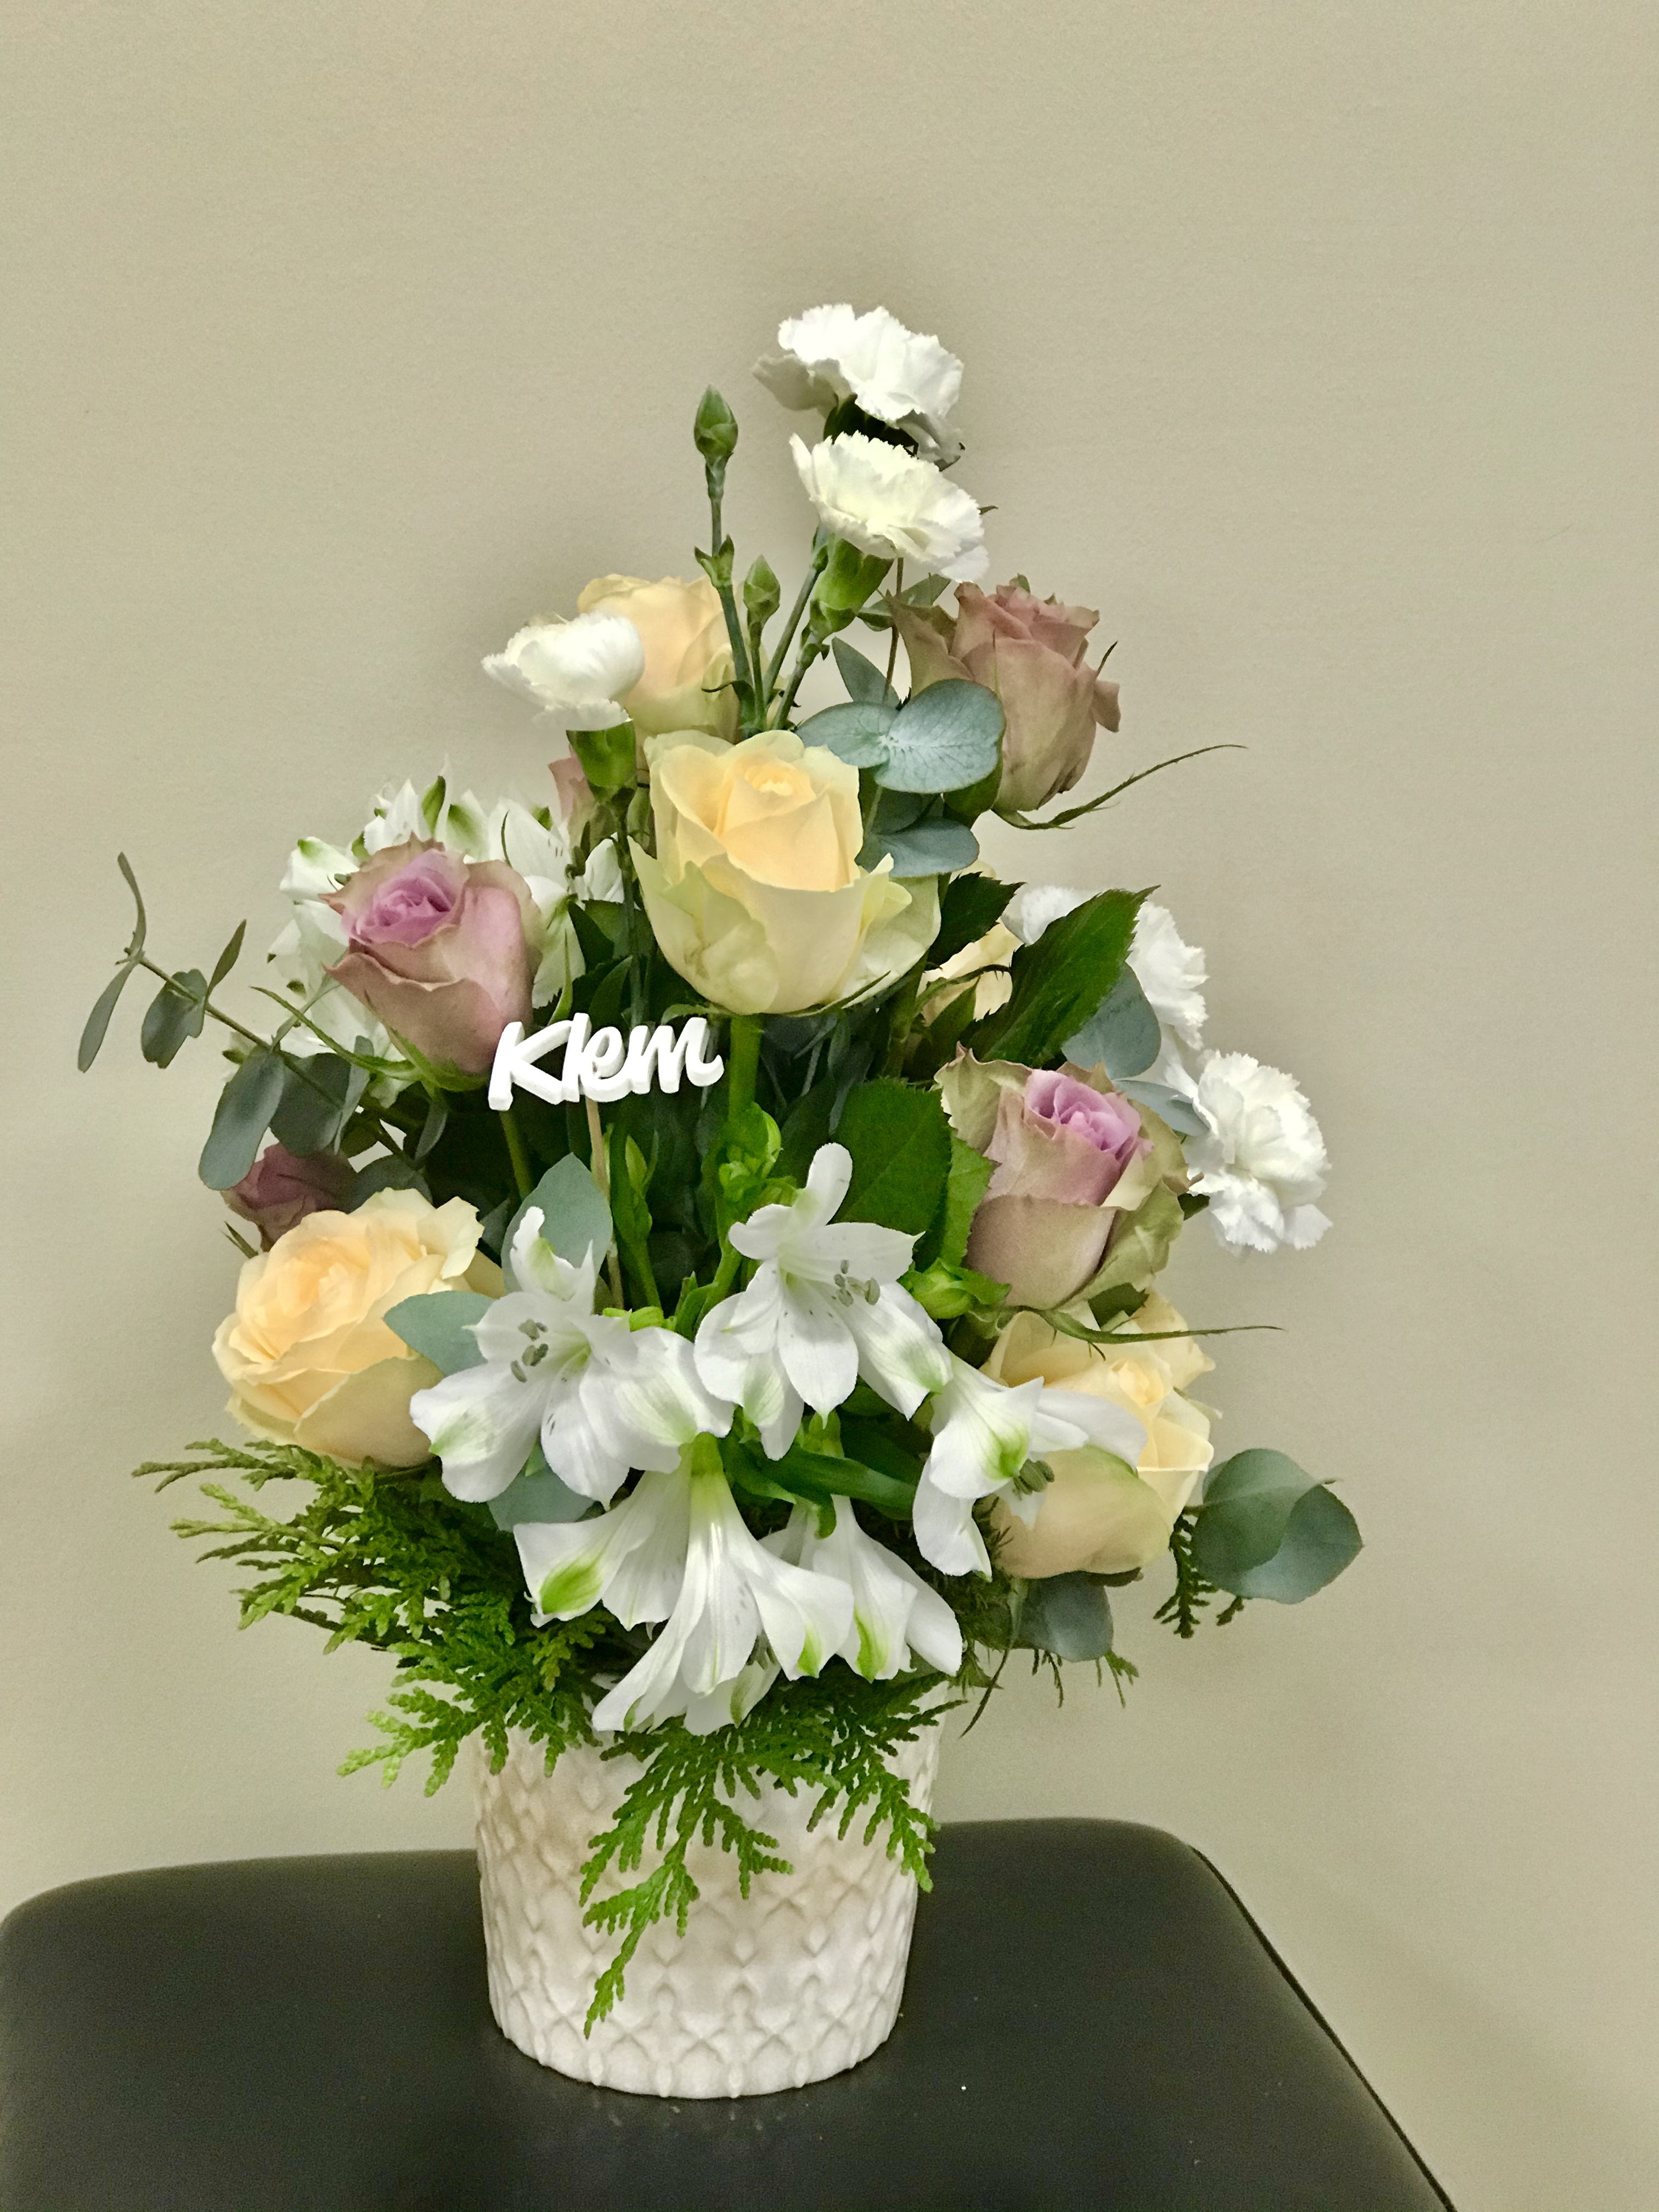 Blomster klem